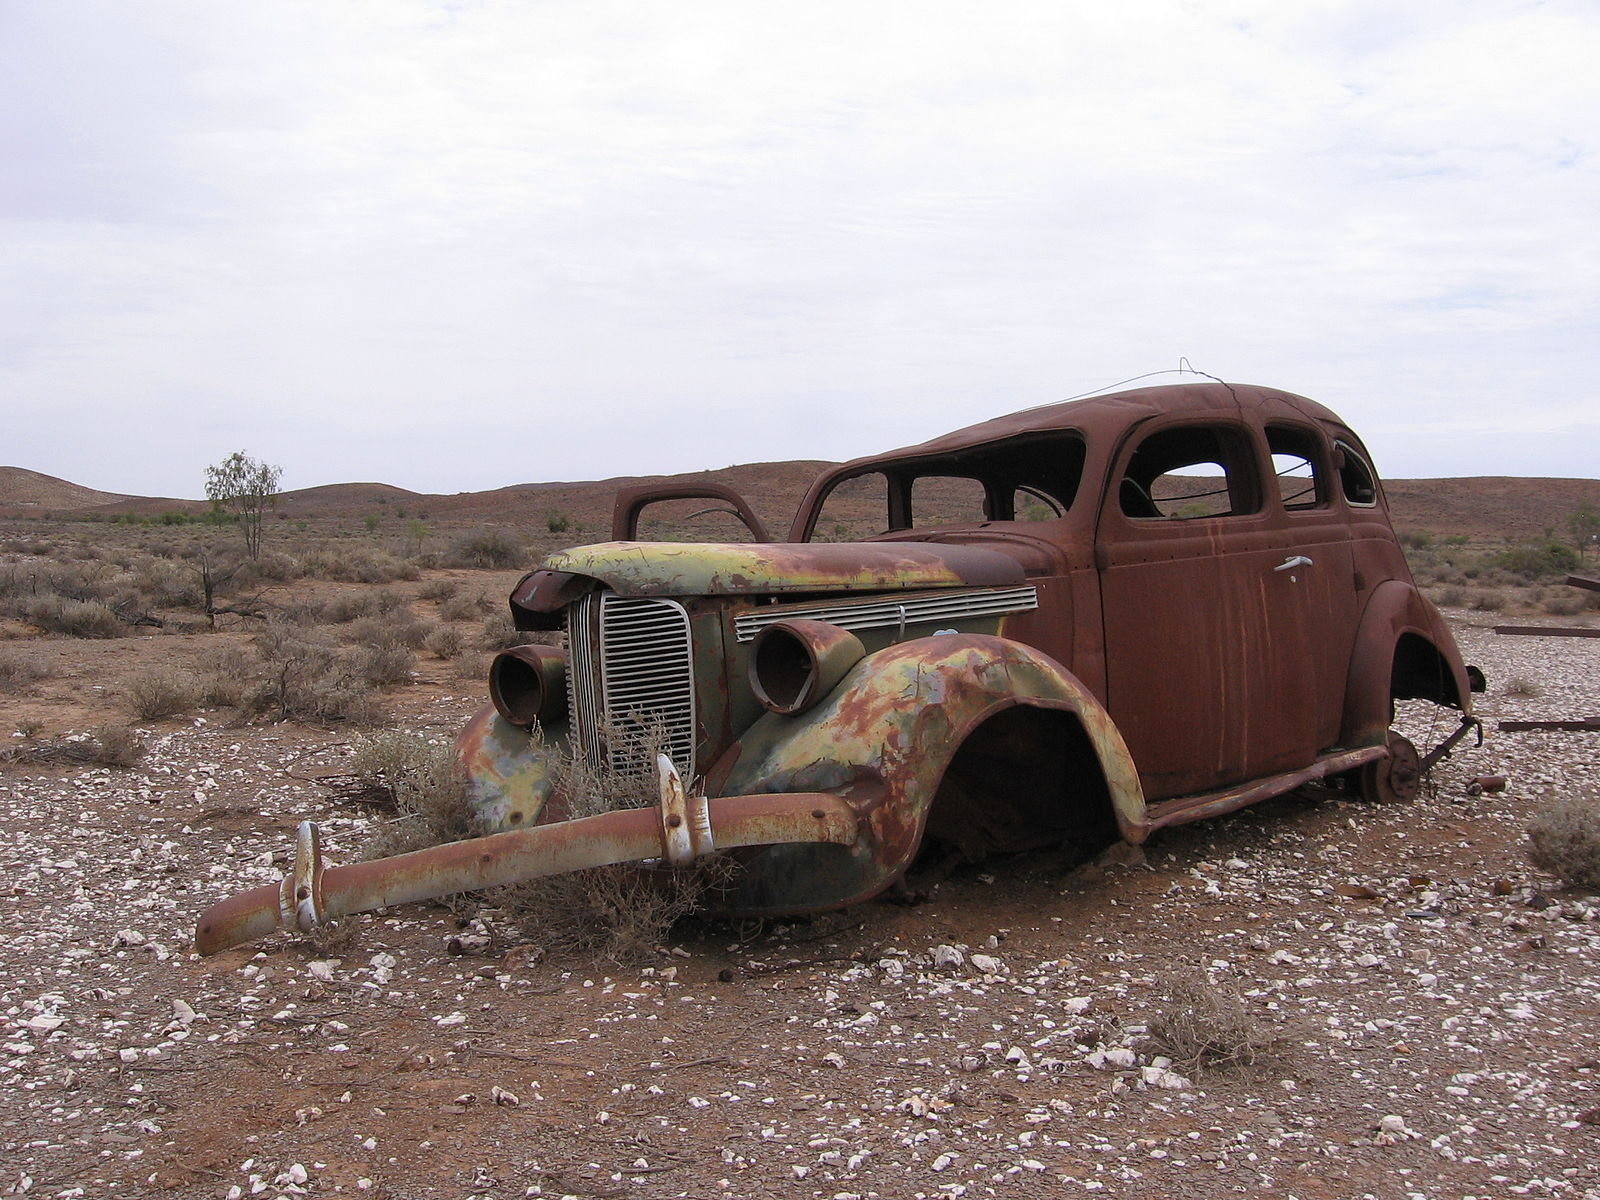 1600px-Rusted_car2C_Strezlecki_Track